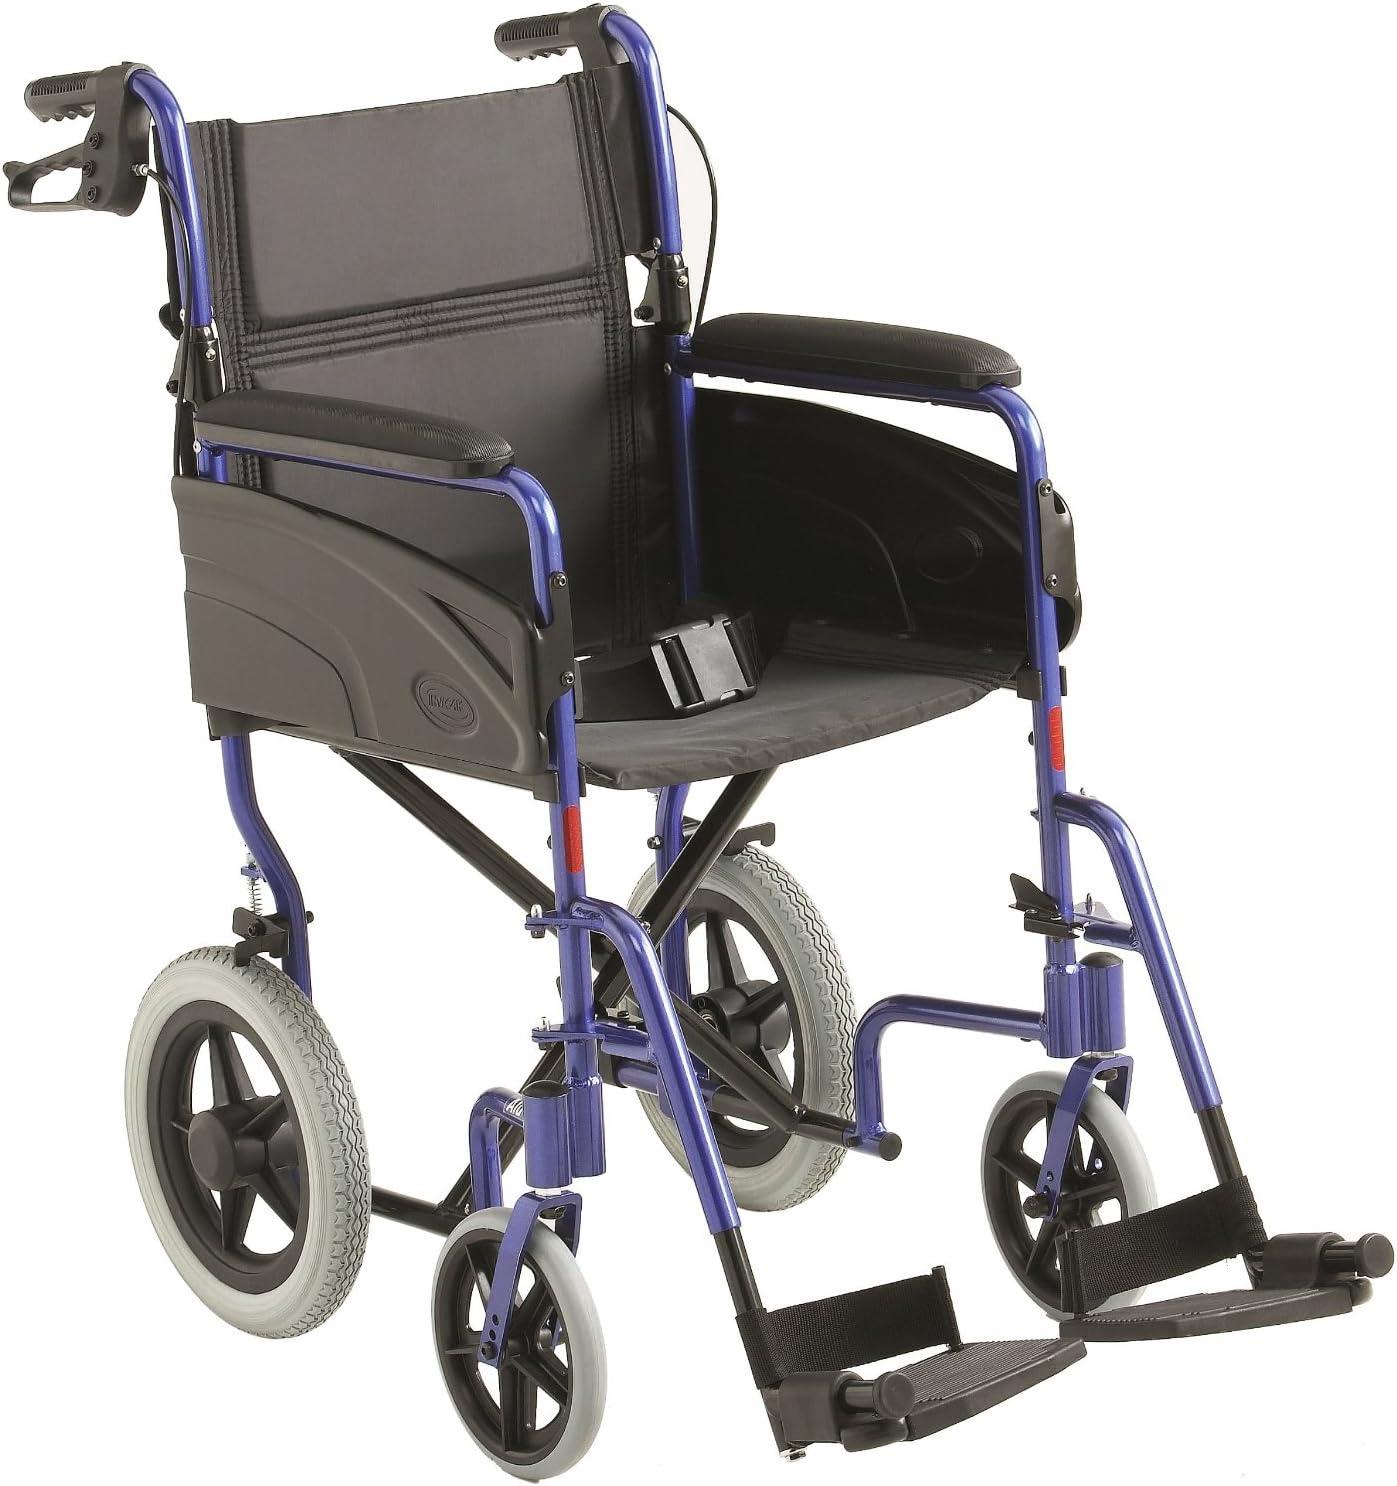 Invacare ligero aluminio transporte silla de ruedas - 18